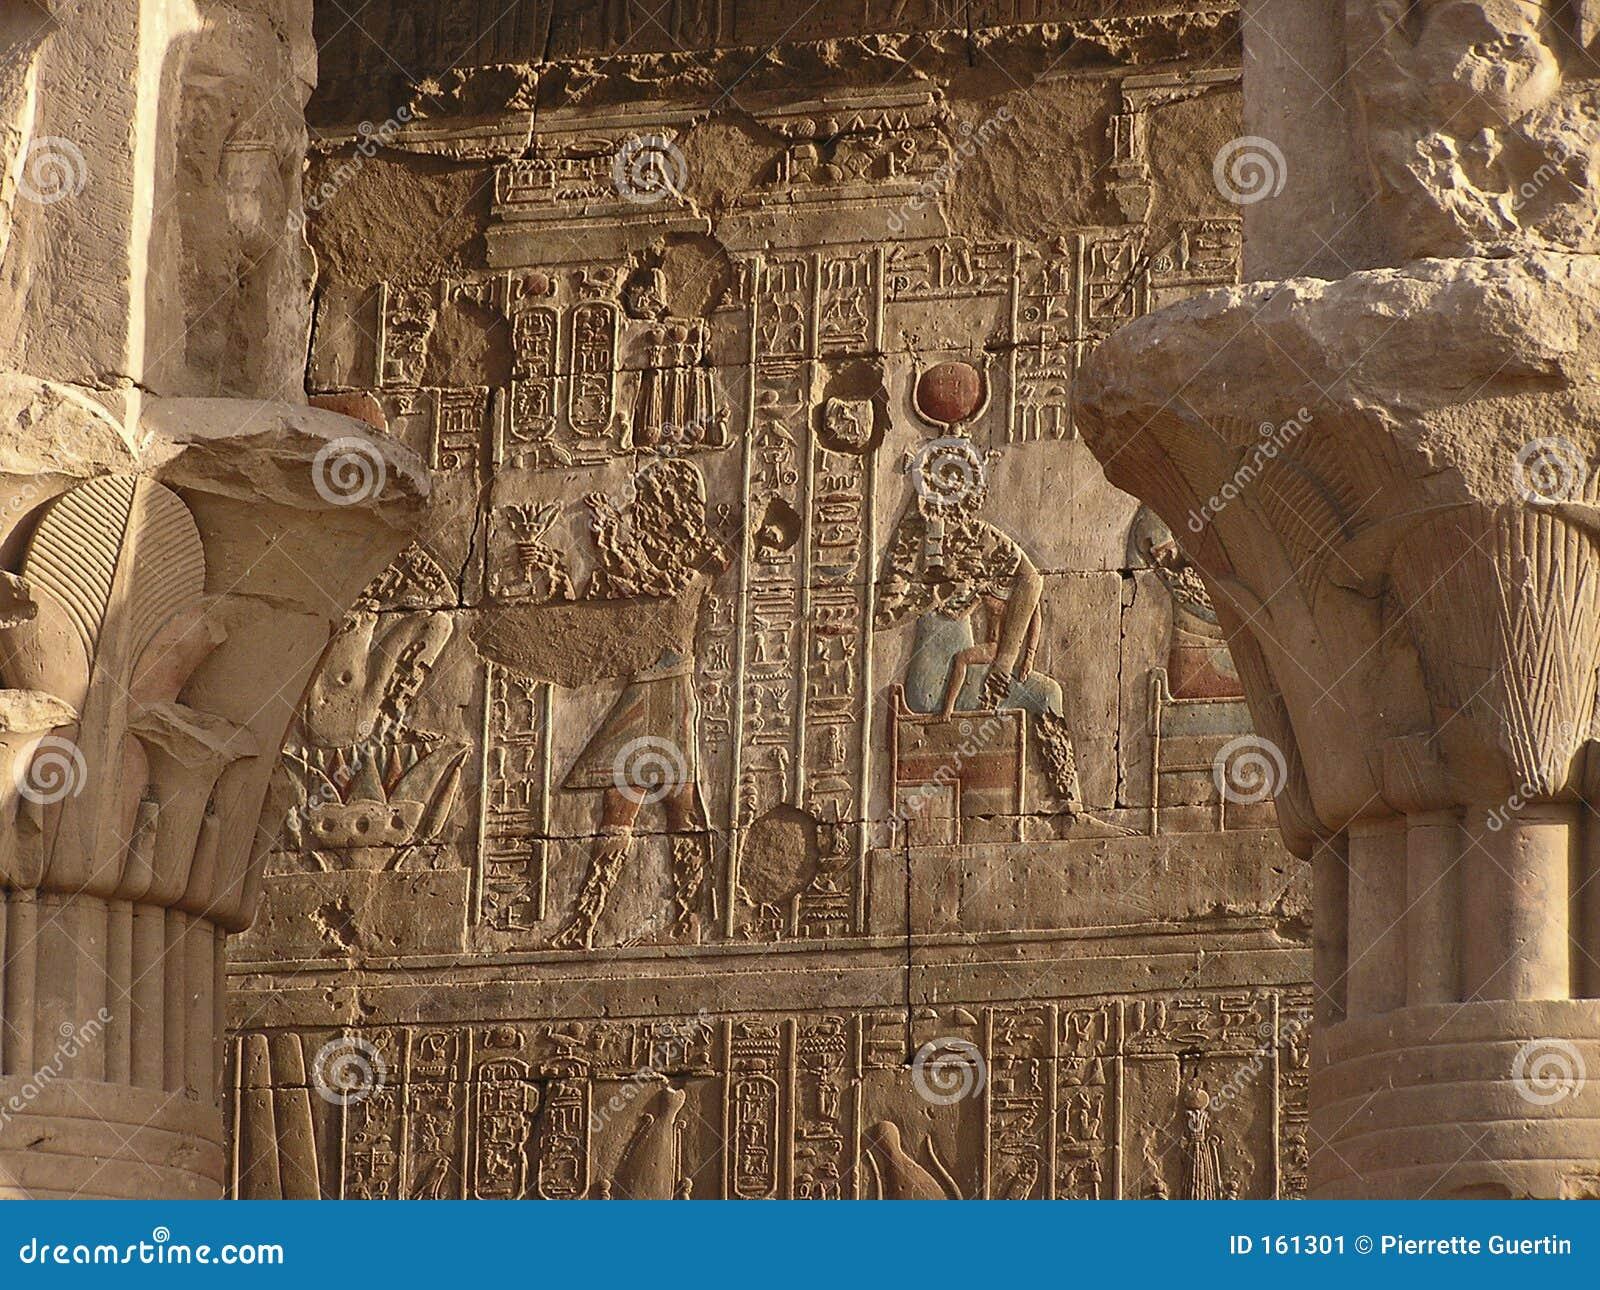 Hieroglyps on Edfu temple